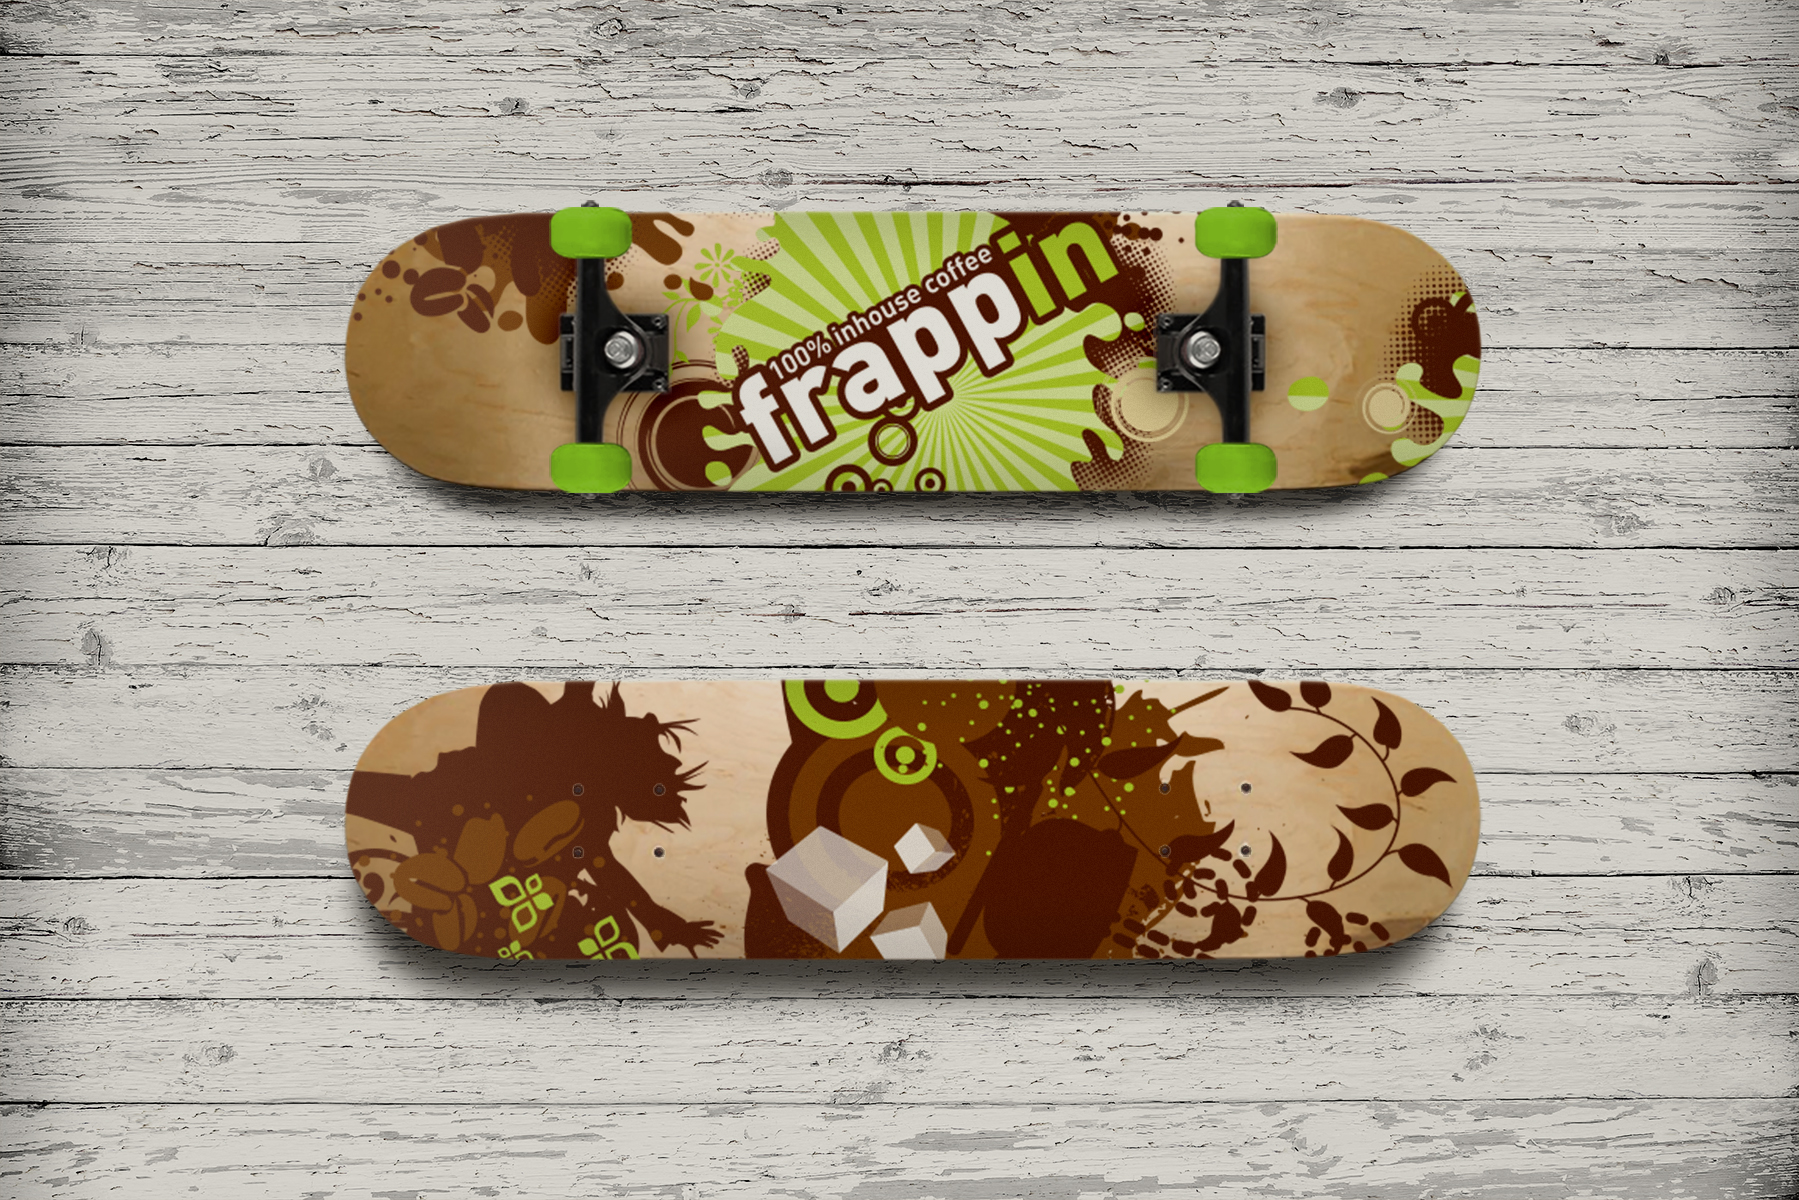 Frappin skateboard